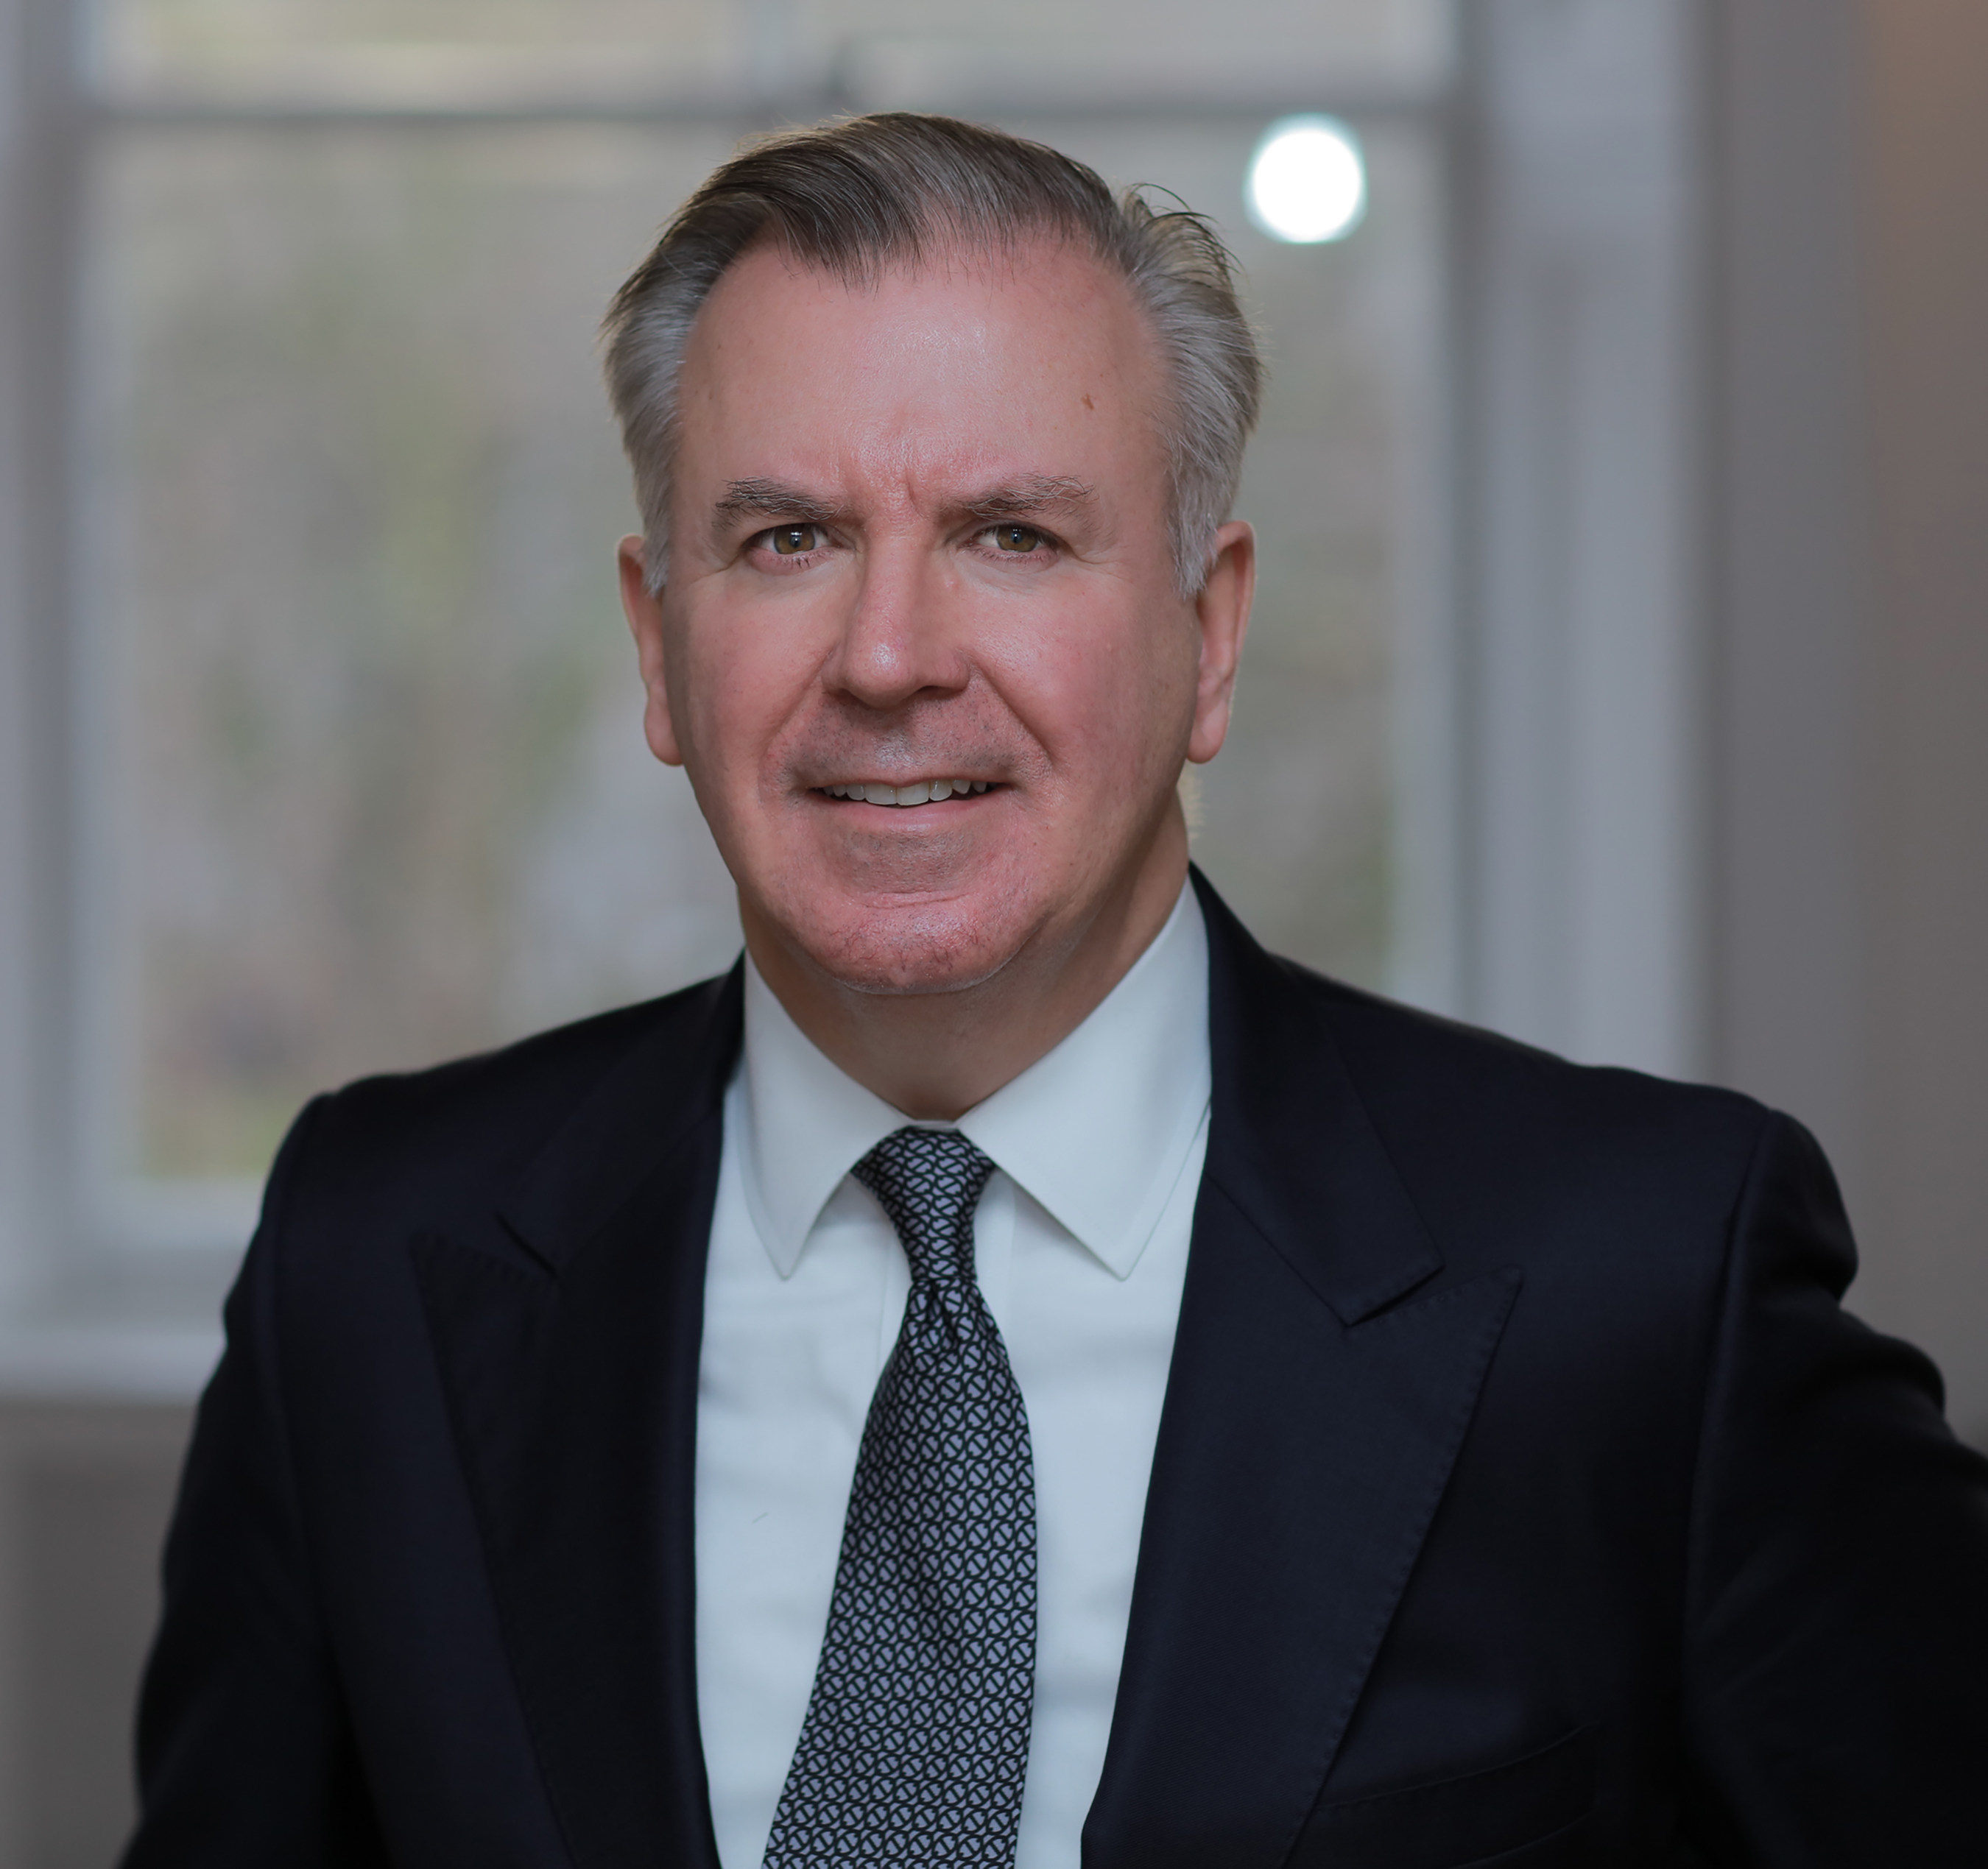 Hycroft stelt Christopher Cooke aan als Directeur van Londens kantoor t.b.v. internationale